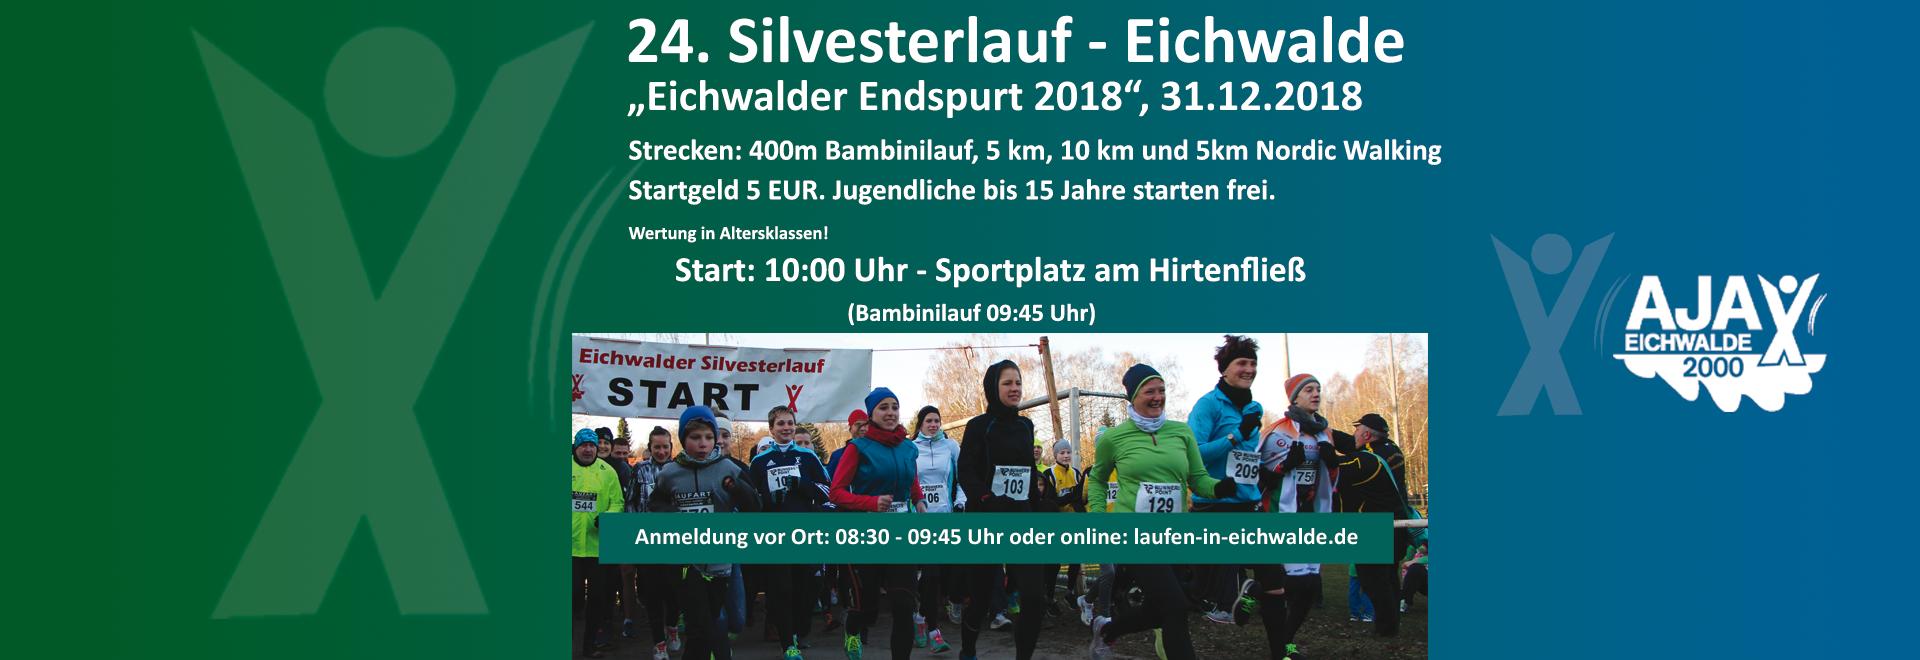 Banner-Website_Silvesterlauf